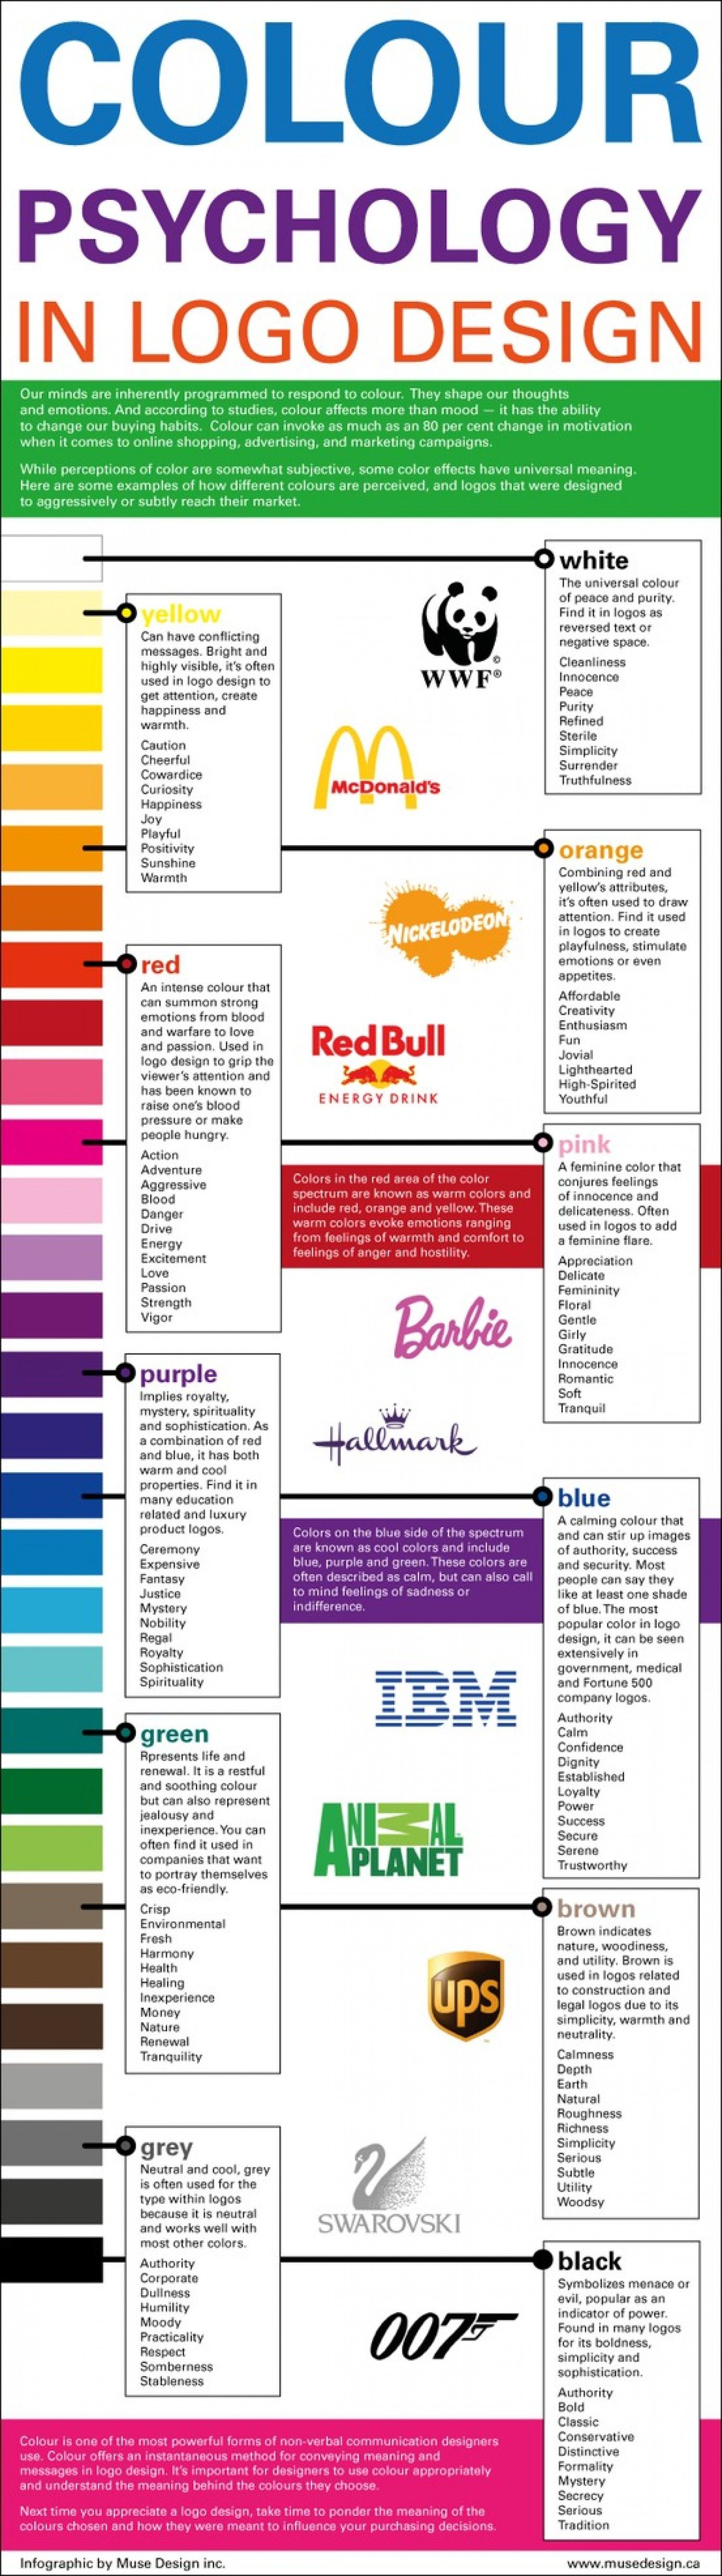 Color Psychology in Logo Design  #infographic